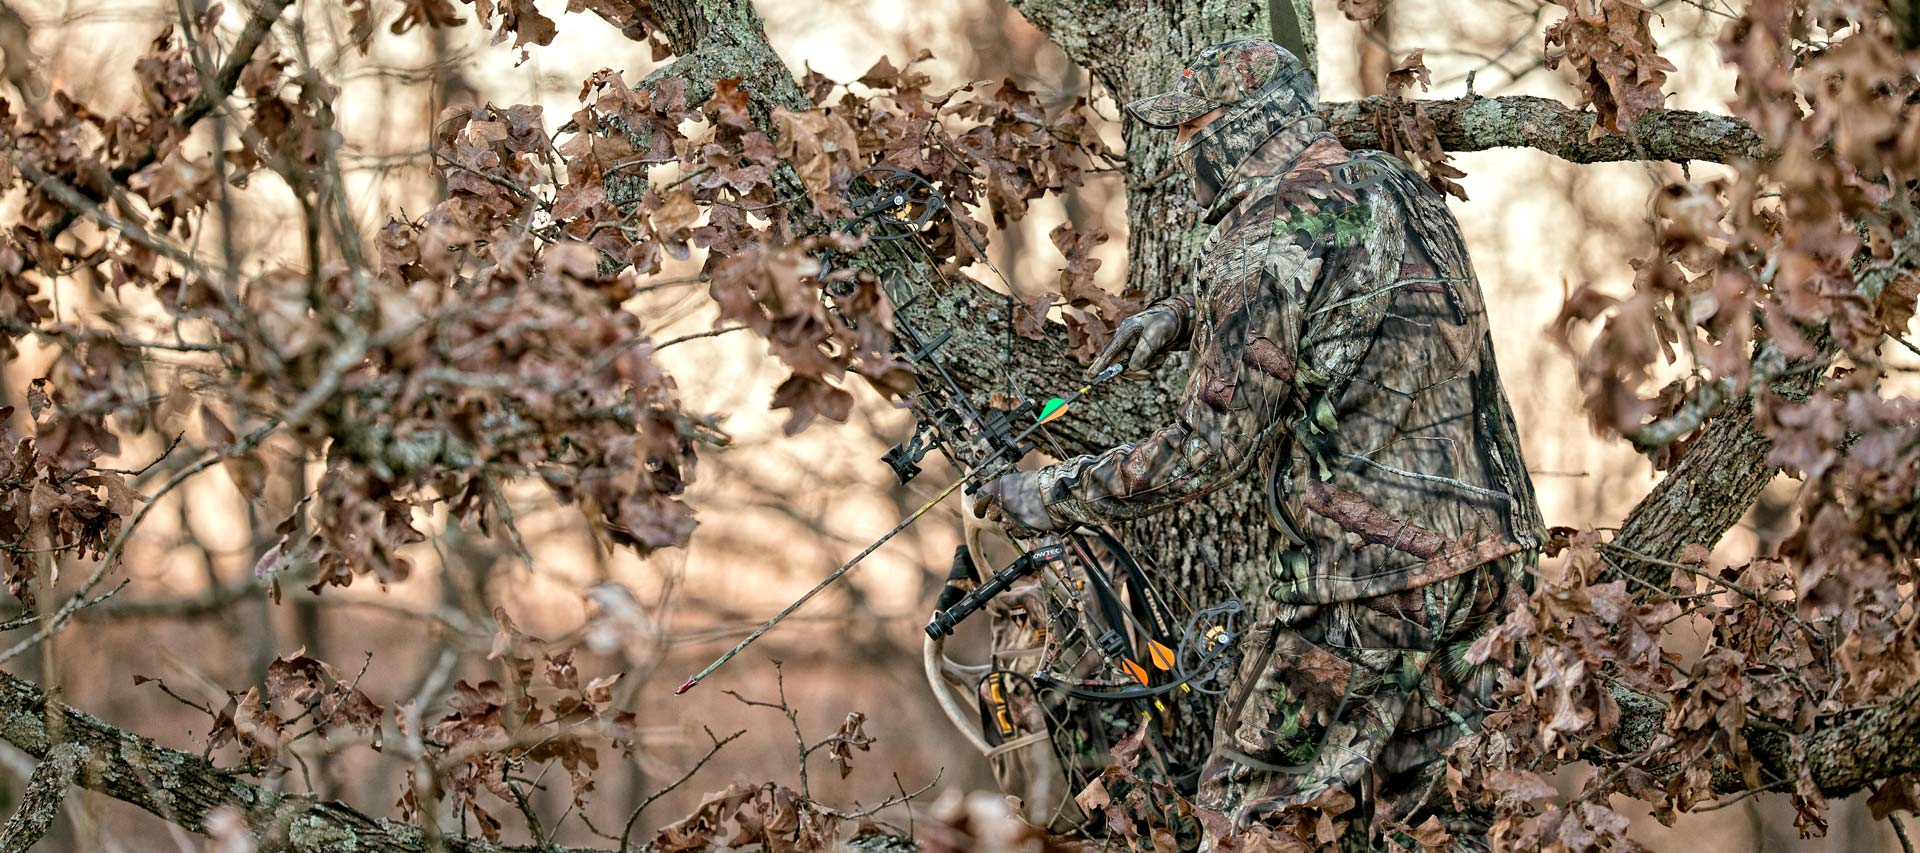 Mossy Oak Break-up Country Lifestyle Photo - Tree - HD Wallpaper